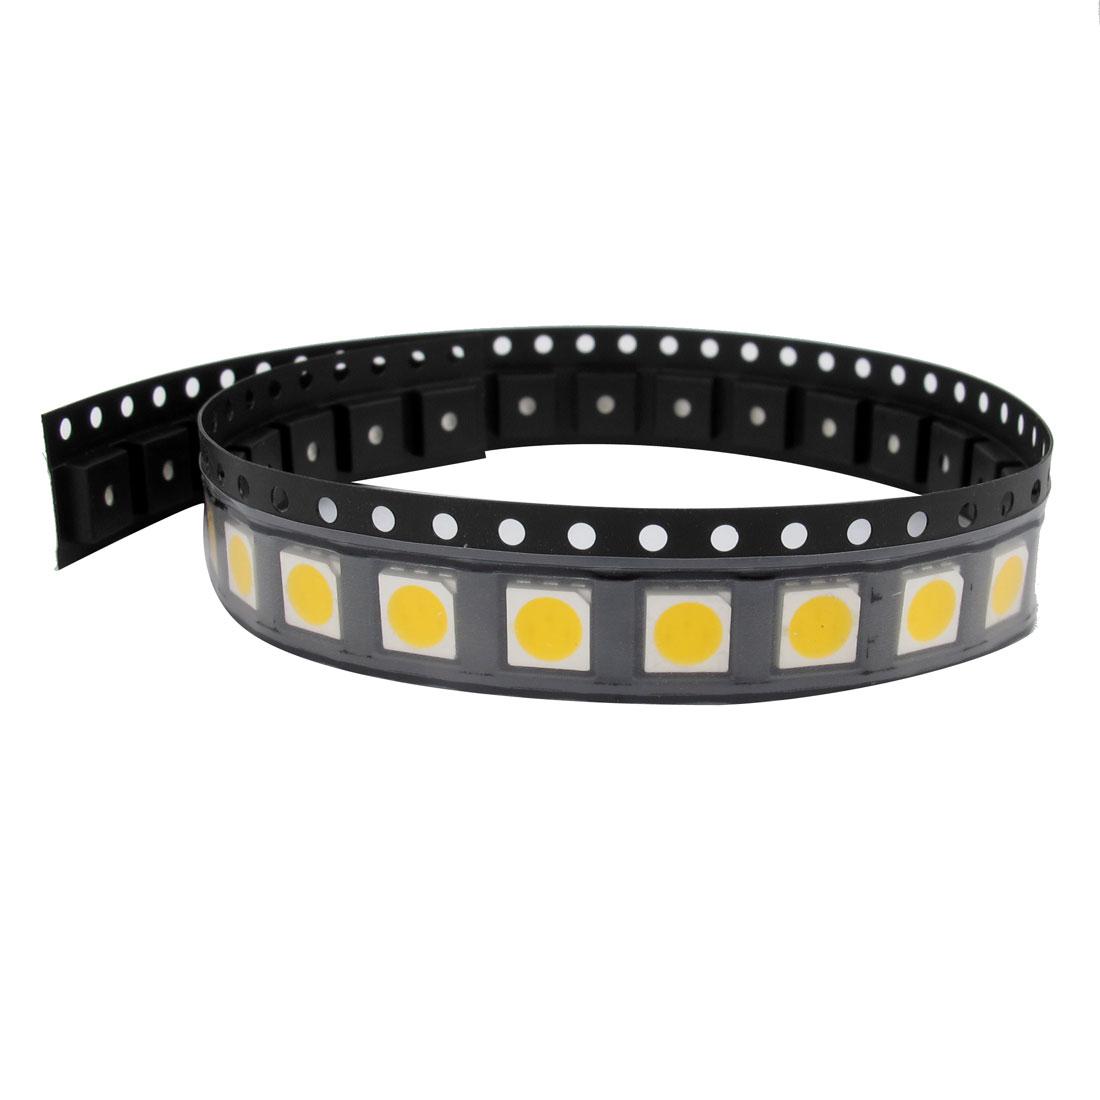 30 Pcs Super Bright SMD 5050 LED Lamp Warm White Light Emitting Diodes